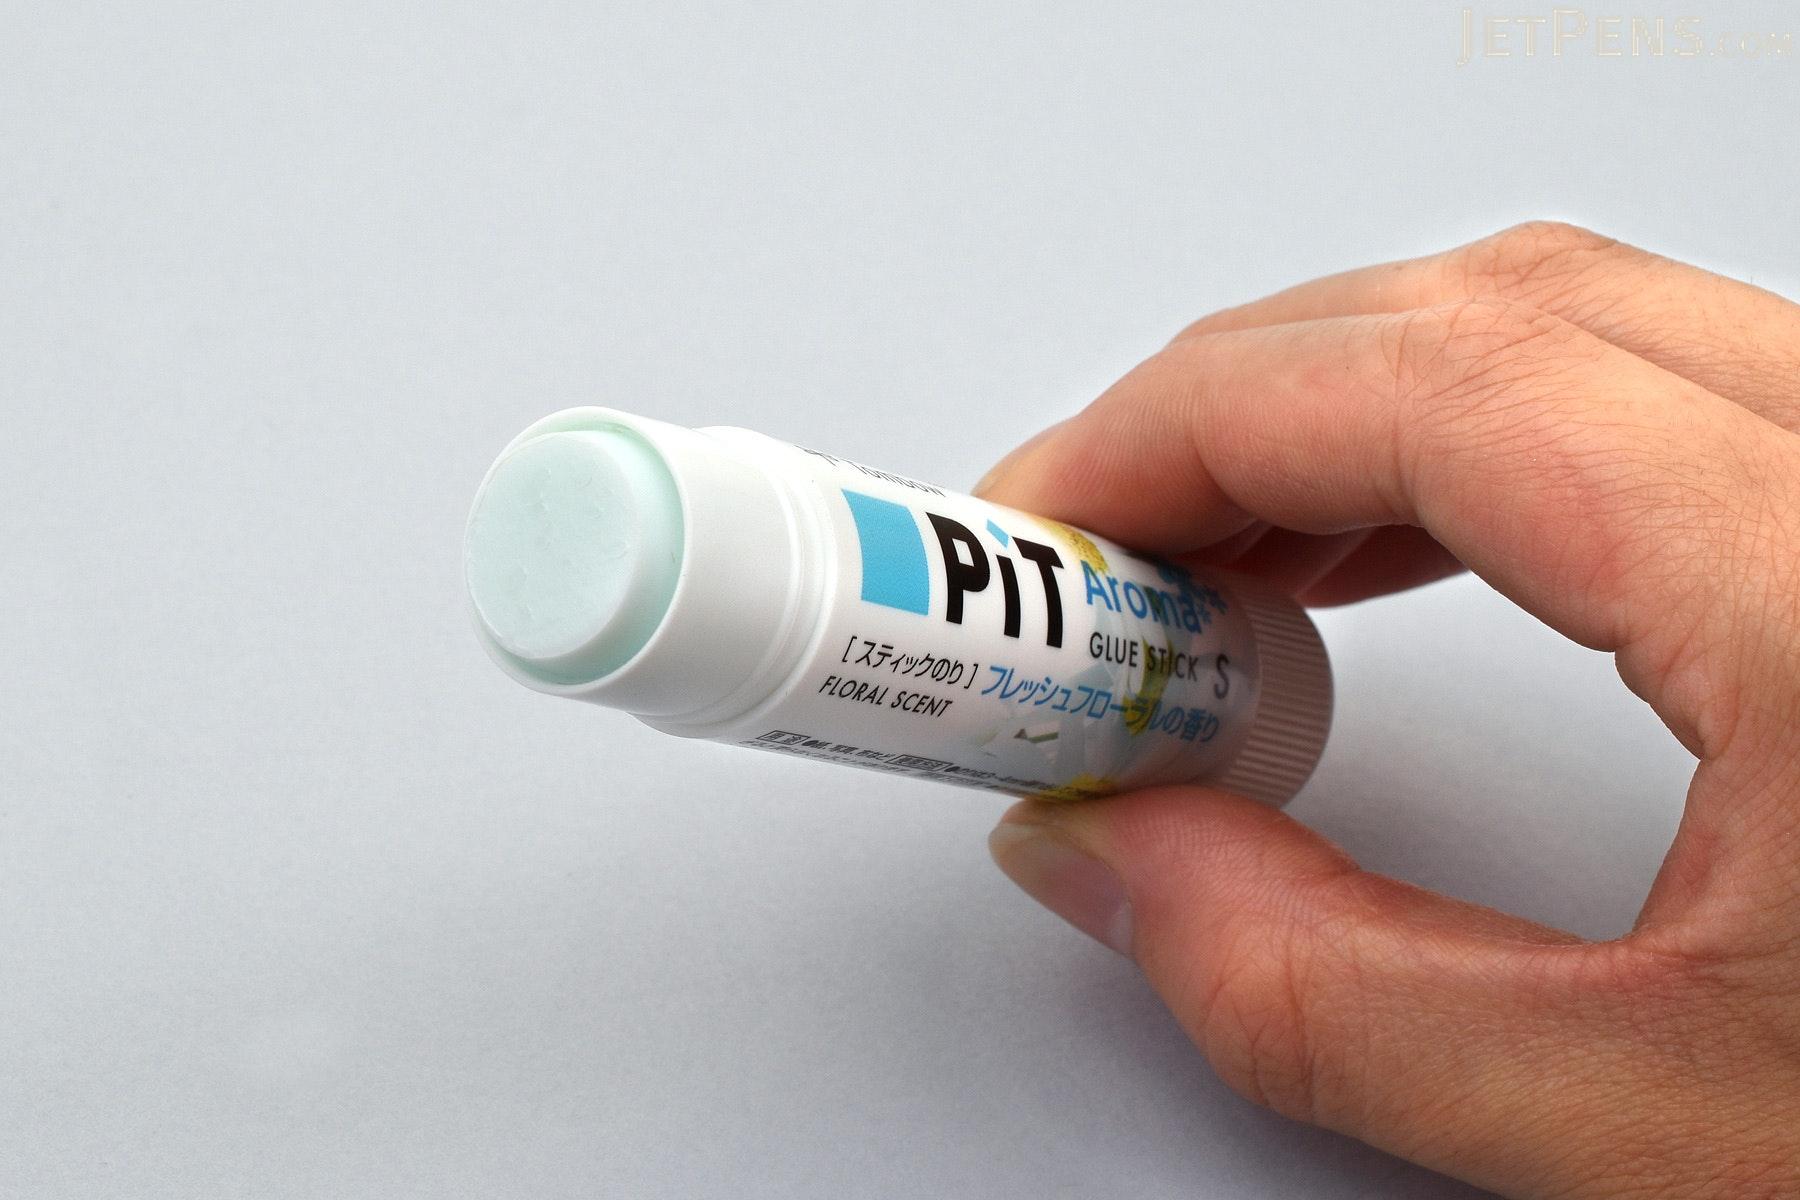 Tombow Pit Hi-Power Aroma Glue Stick - Fresh Floral - TOMBOW PT-TPK03